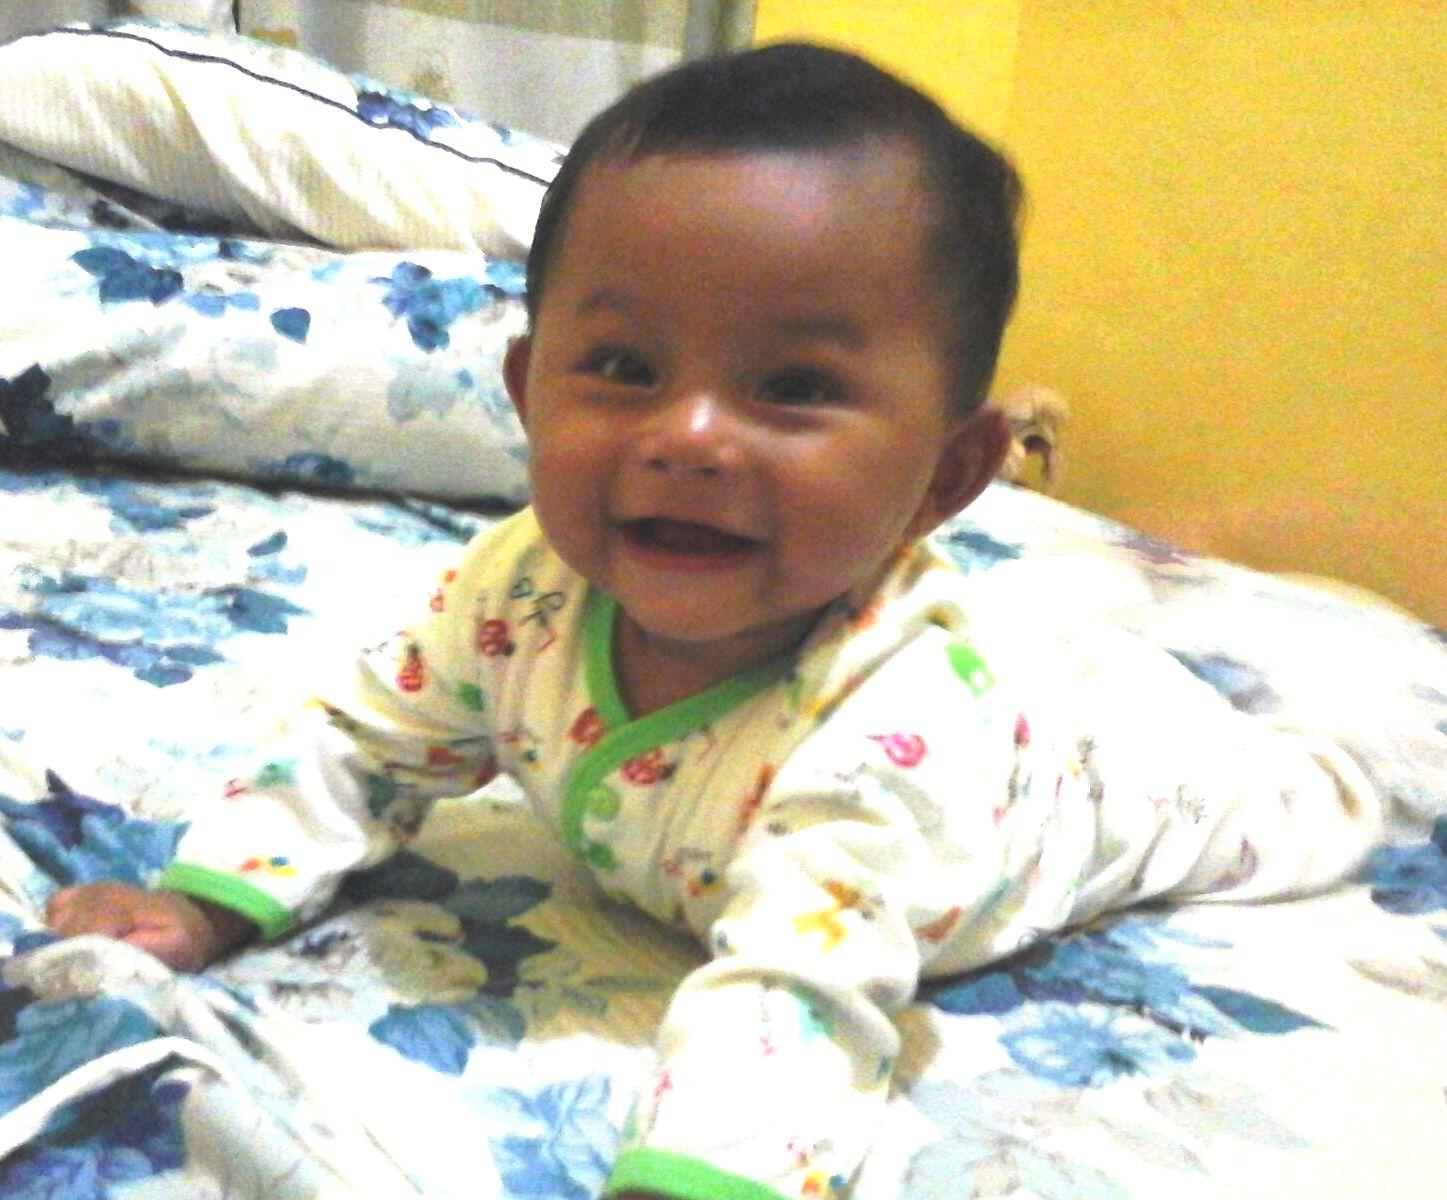 Isamas54 Pertumbuhan Dan Perkembangan Bayi Umur 0 S D 6 Bulan